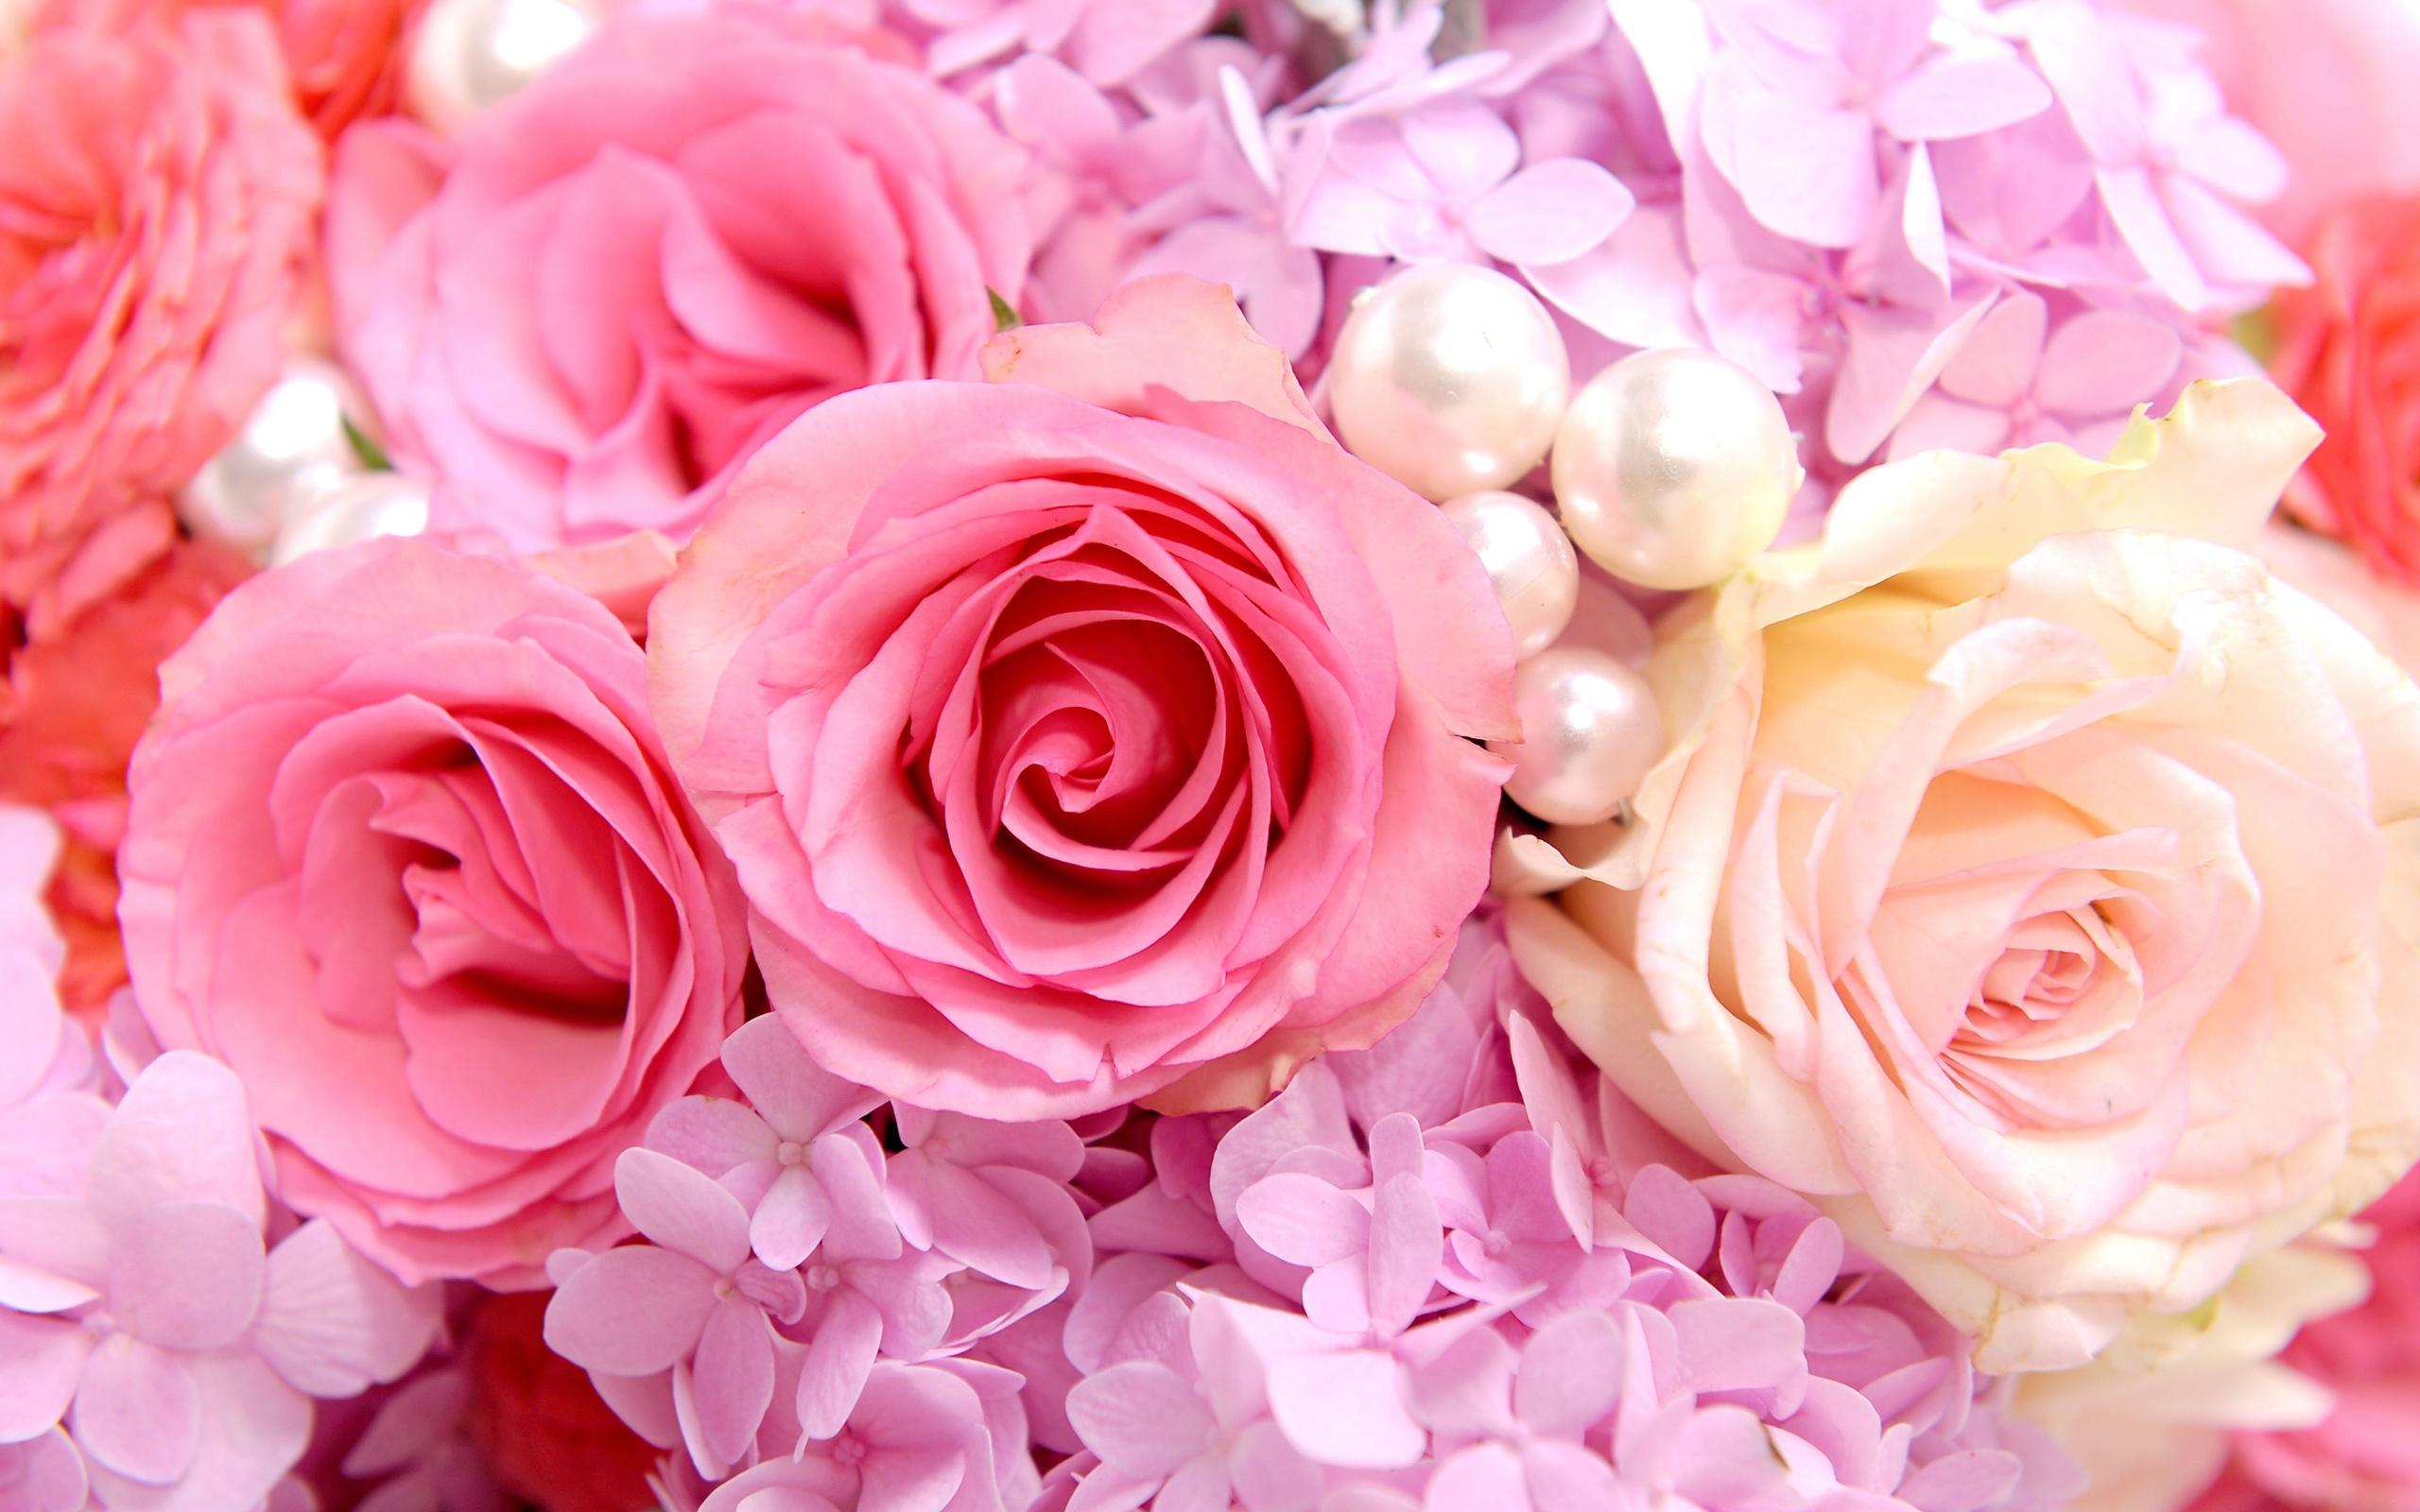 Rosa rosen hintergrund 2560x1600 hd hintergrundbilder hd - Pink rose hd wallpaper ...